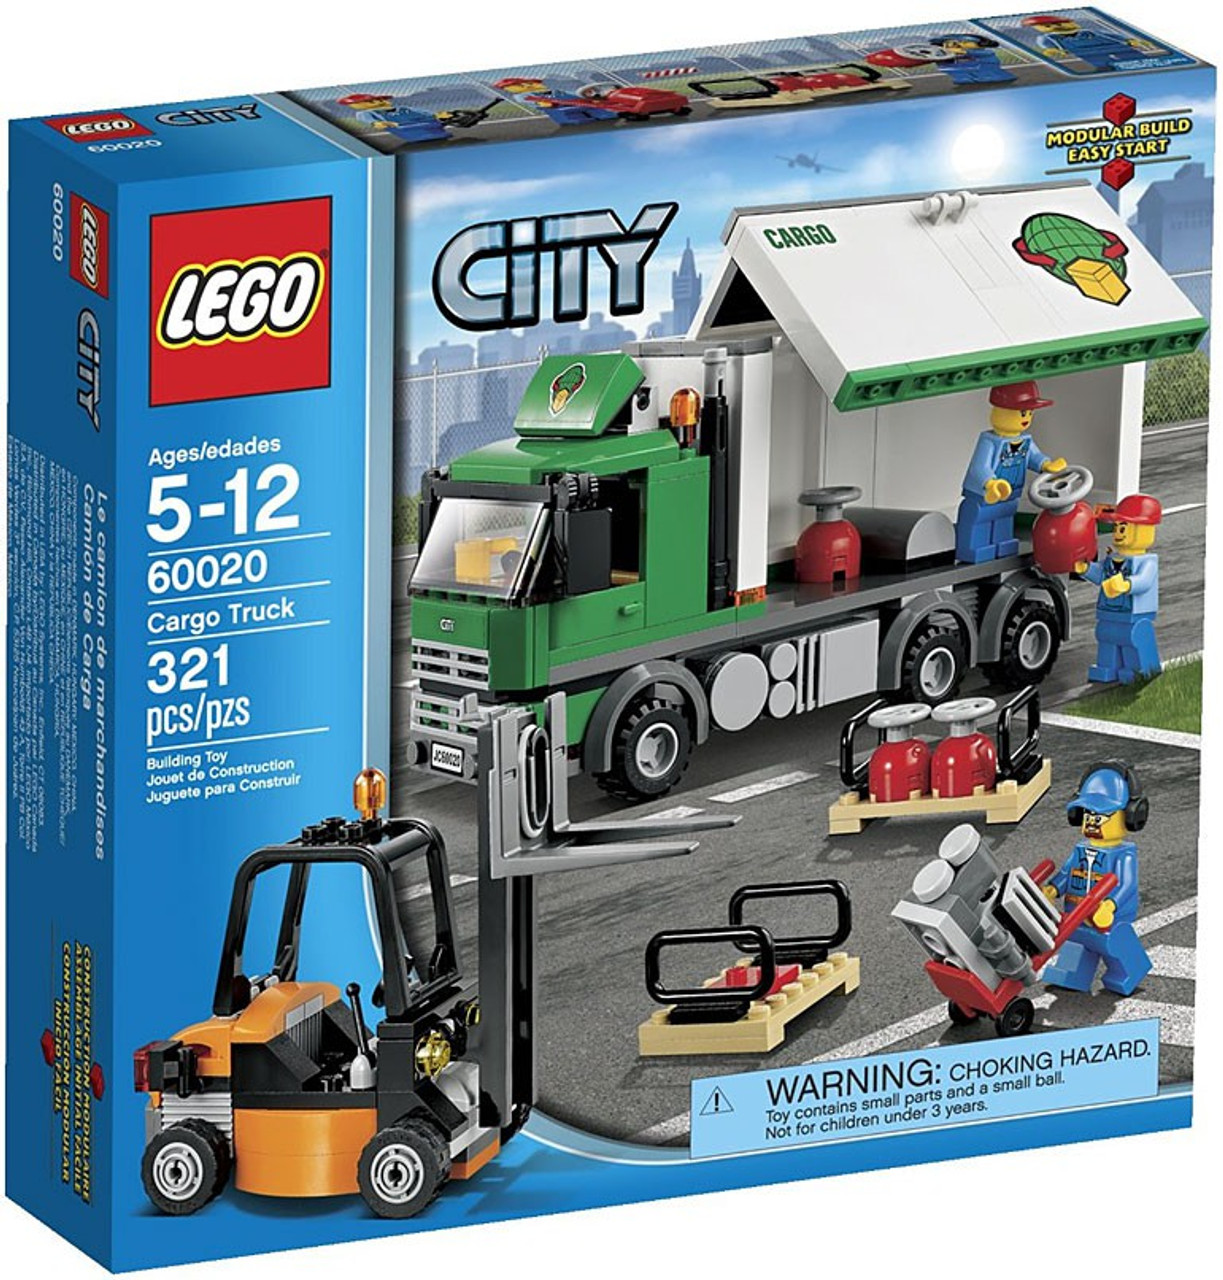 LEGO City Cargo Truck Set #60020